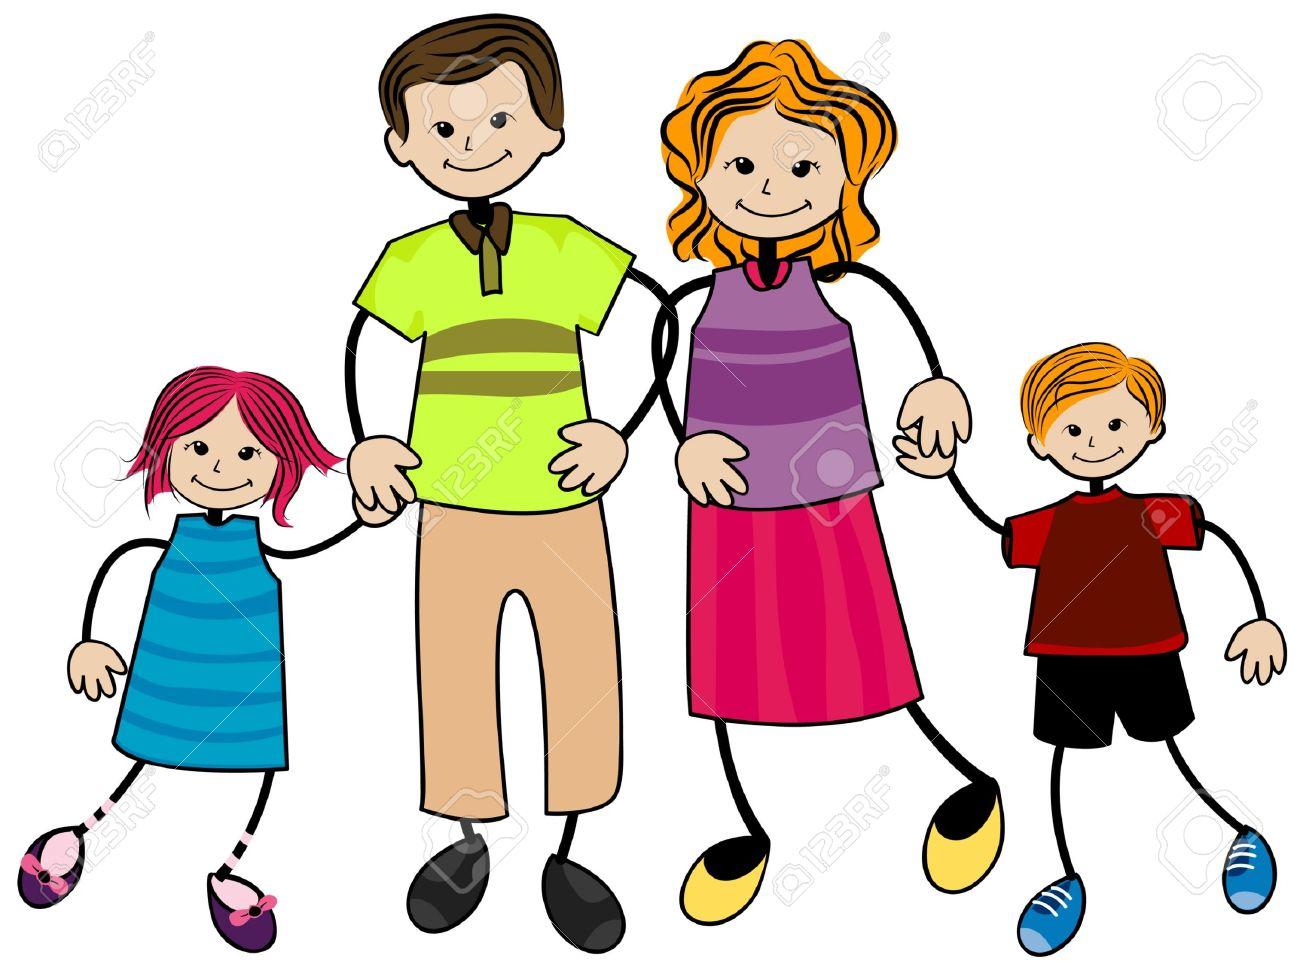 family clipart-family clipart-14